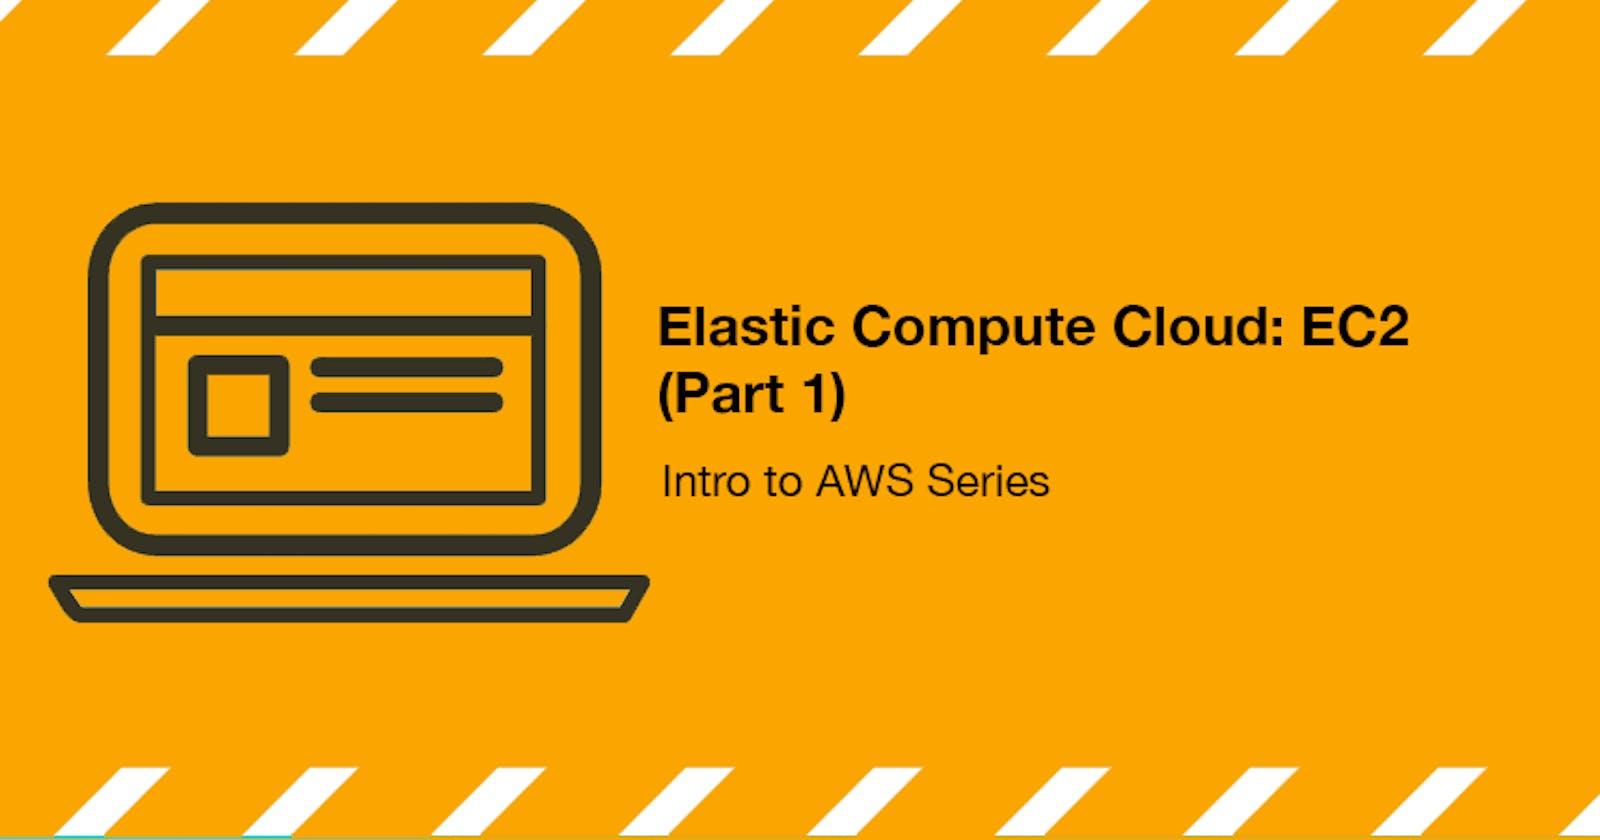 Elastic Compute Cloud: EC2 (Intro to AWS Series)